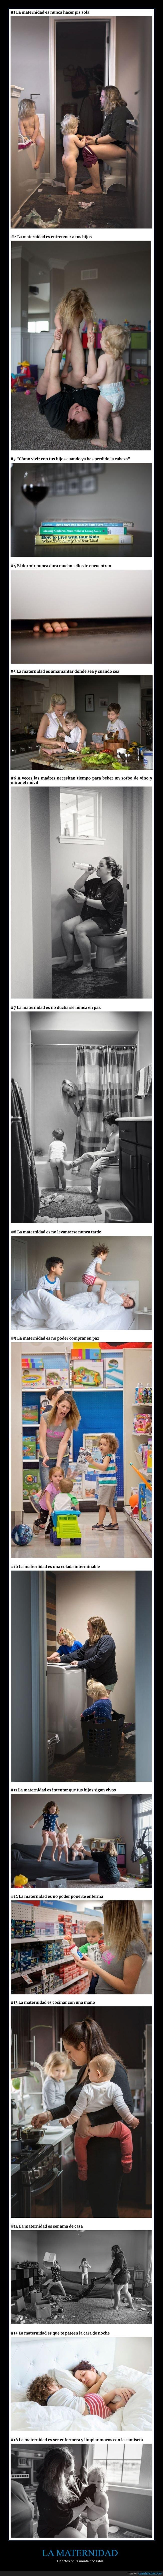 hijos,madres,maternidad